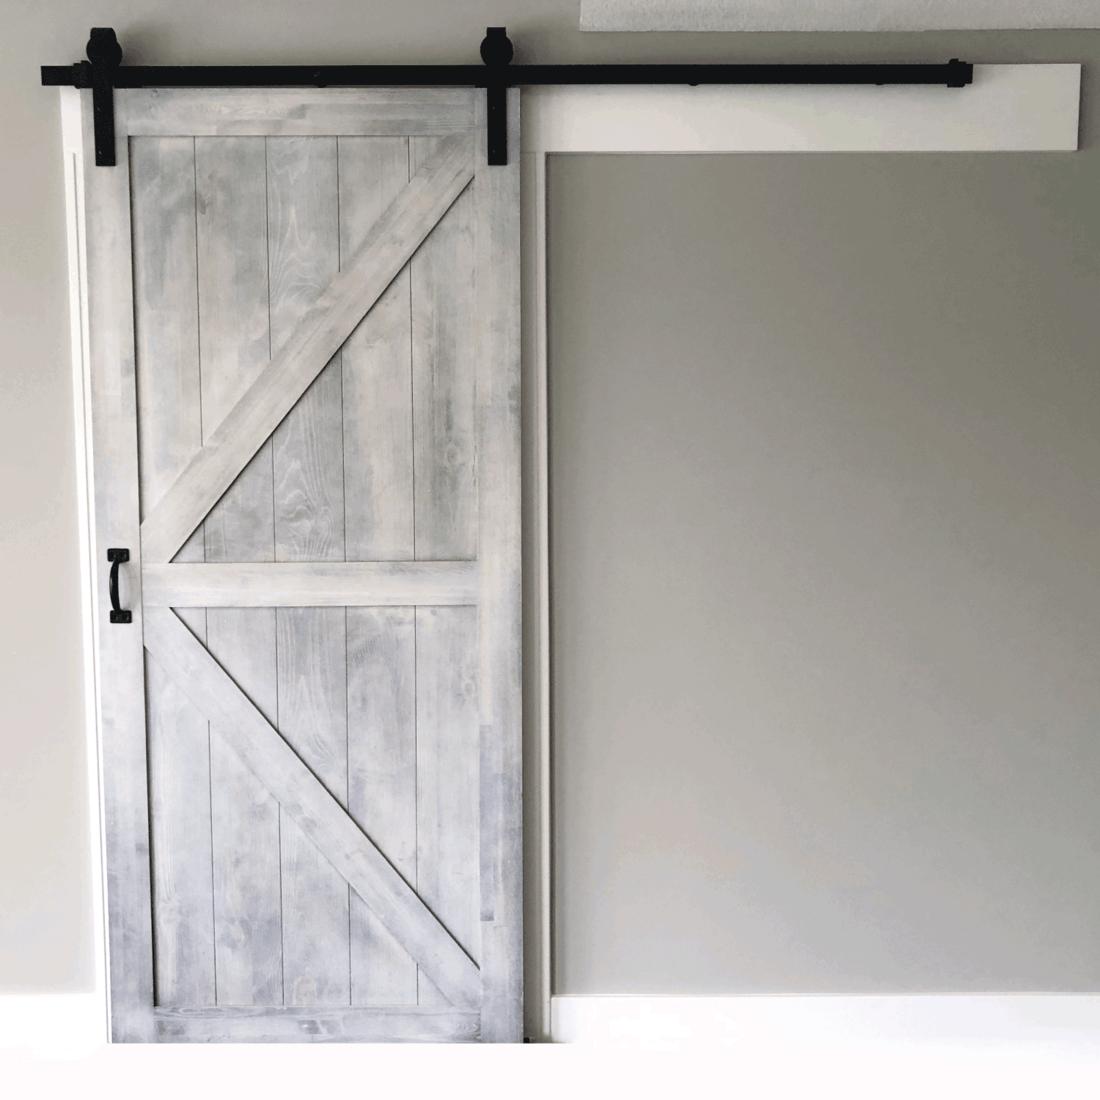 Whitewashed Barn Door